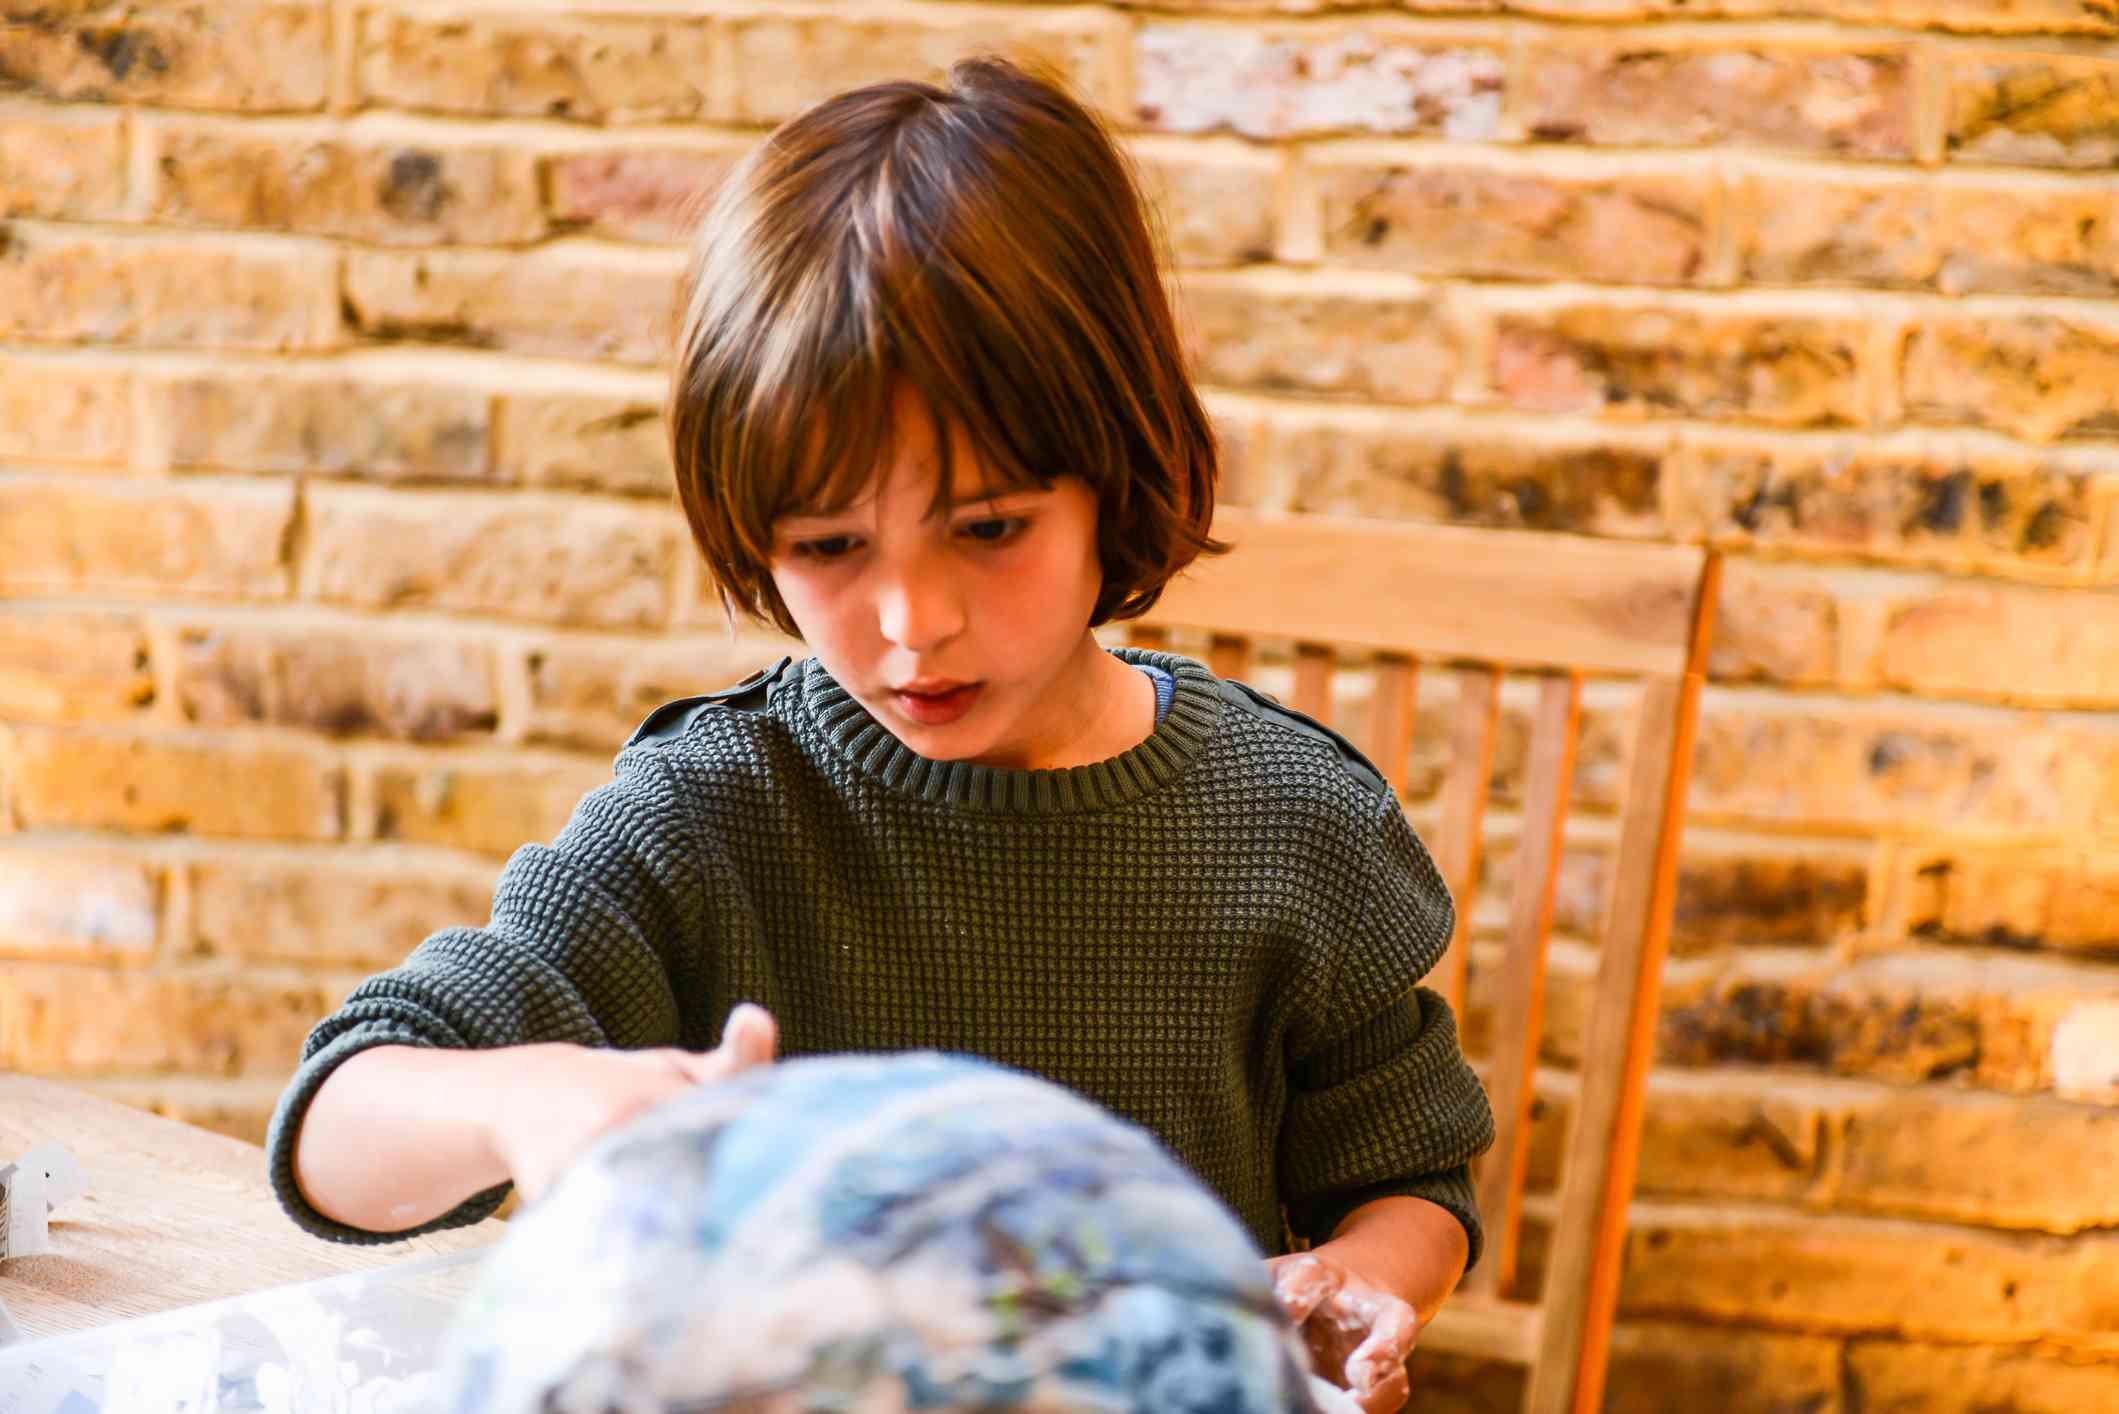 Child with paper mache